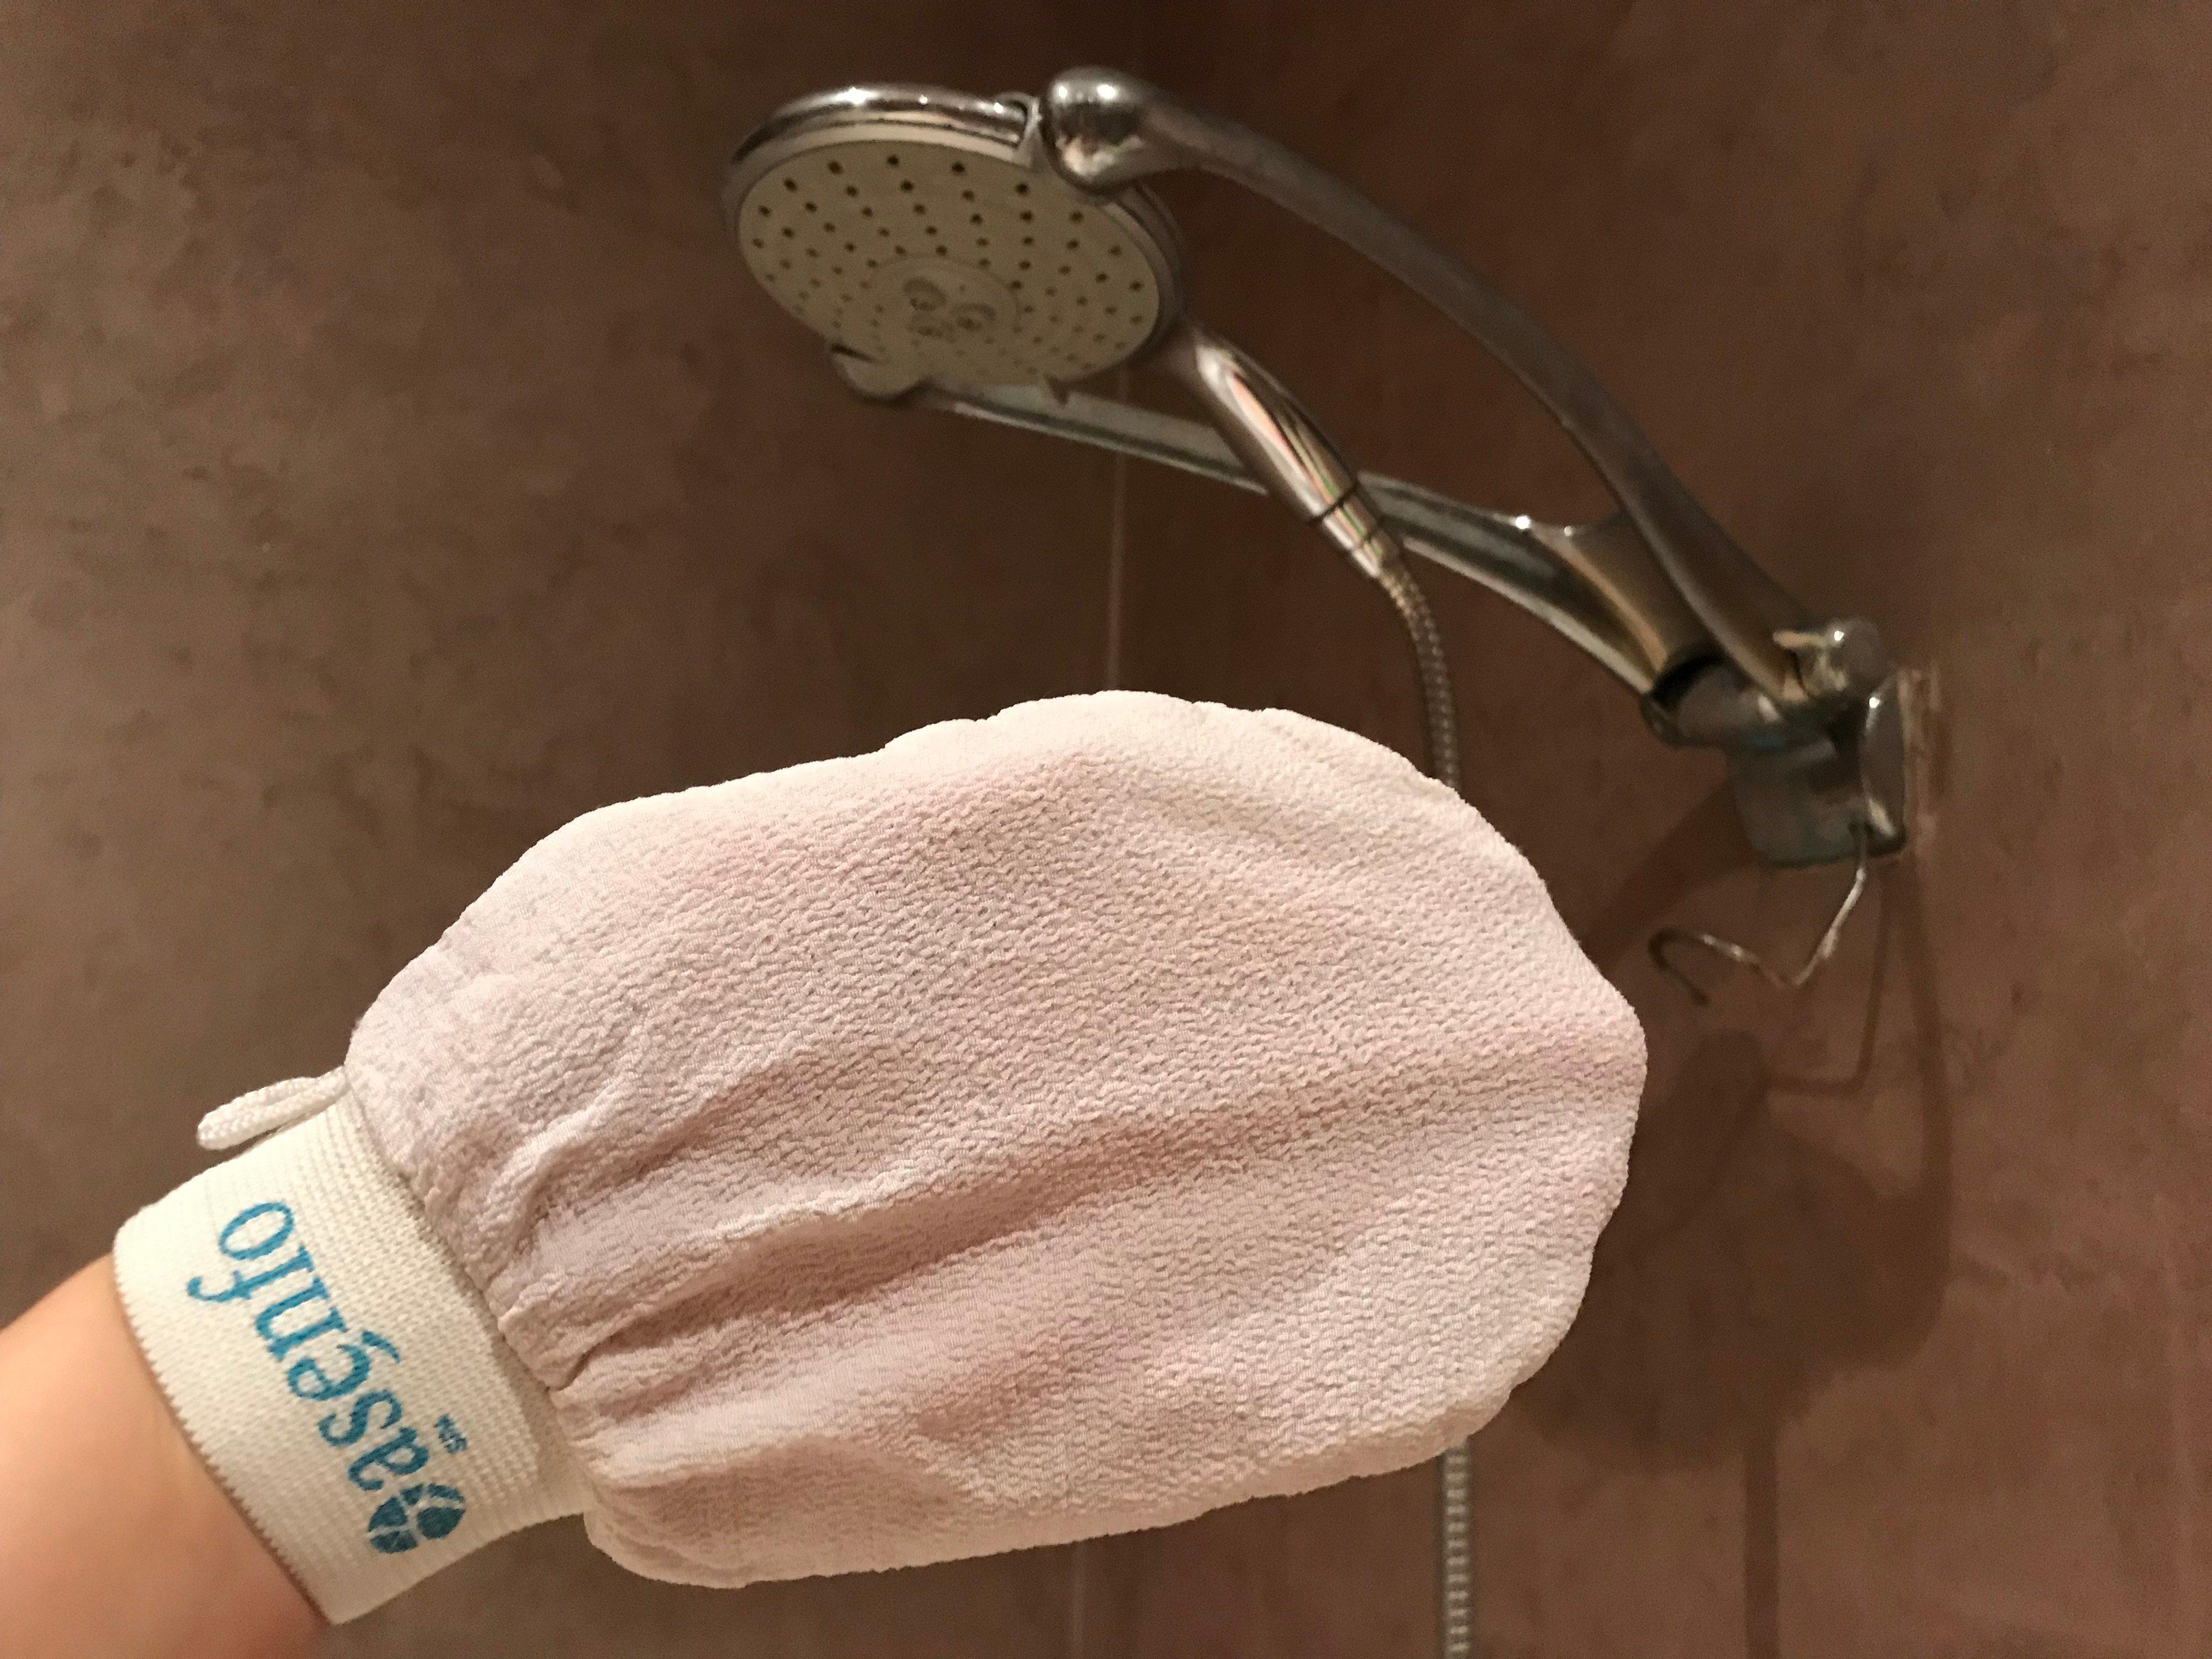 Der ominöse Rubbel-Handschuh